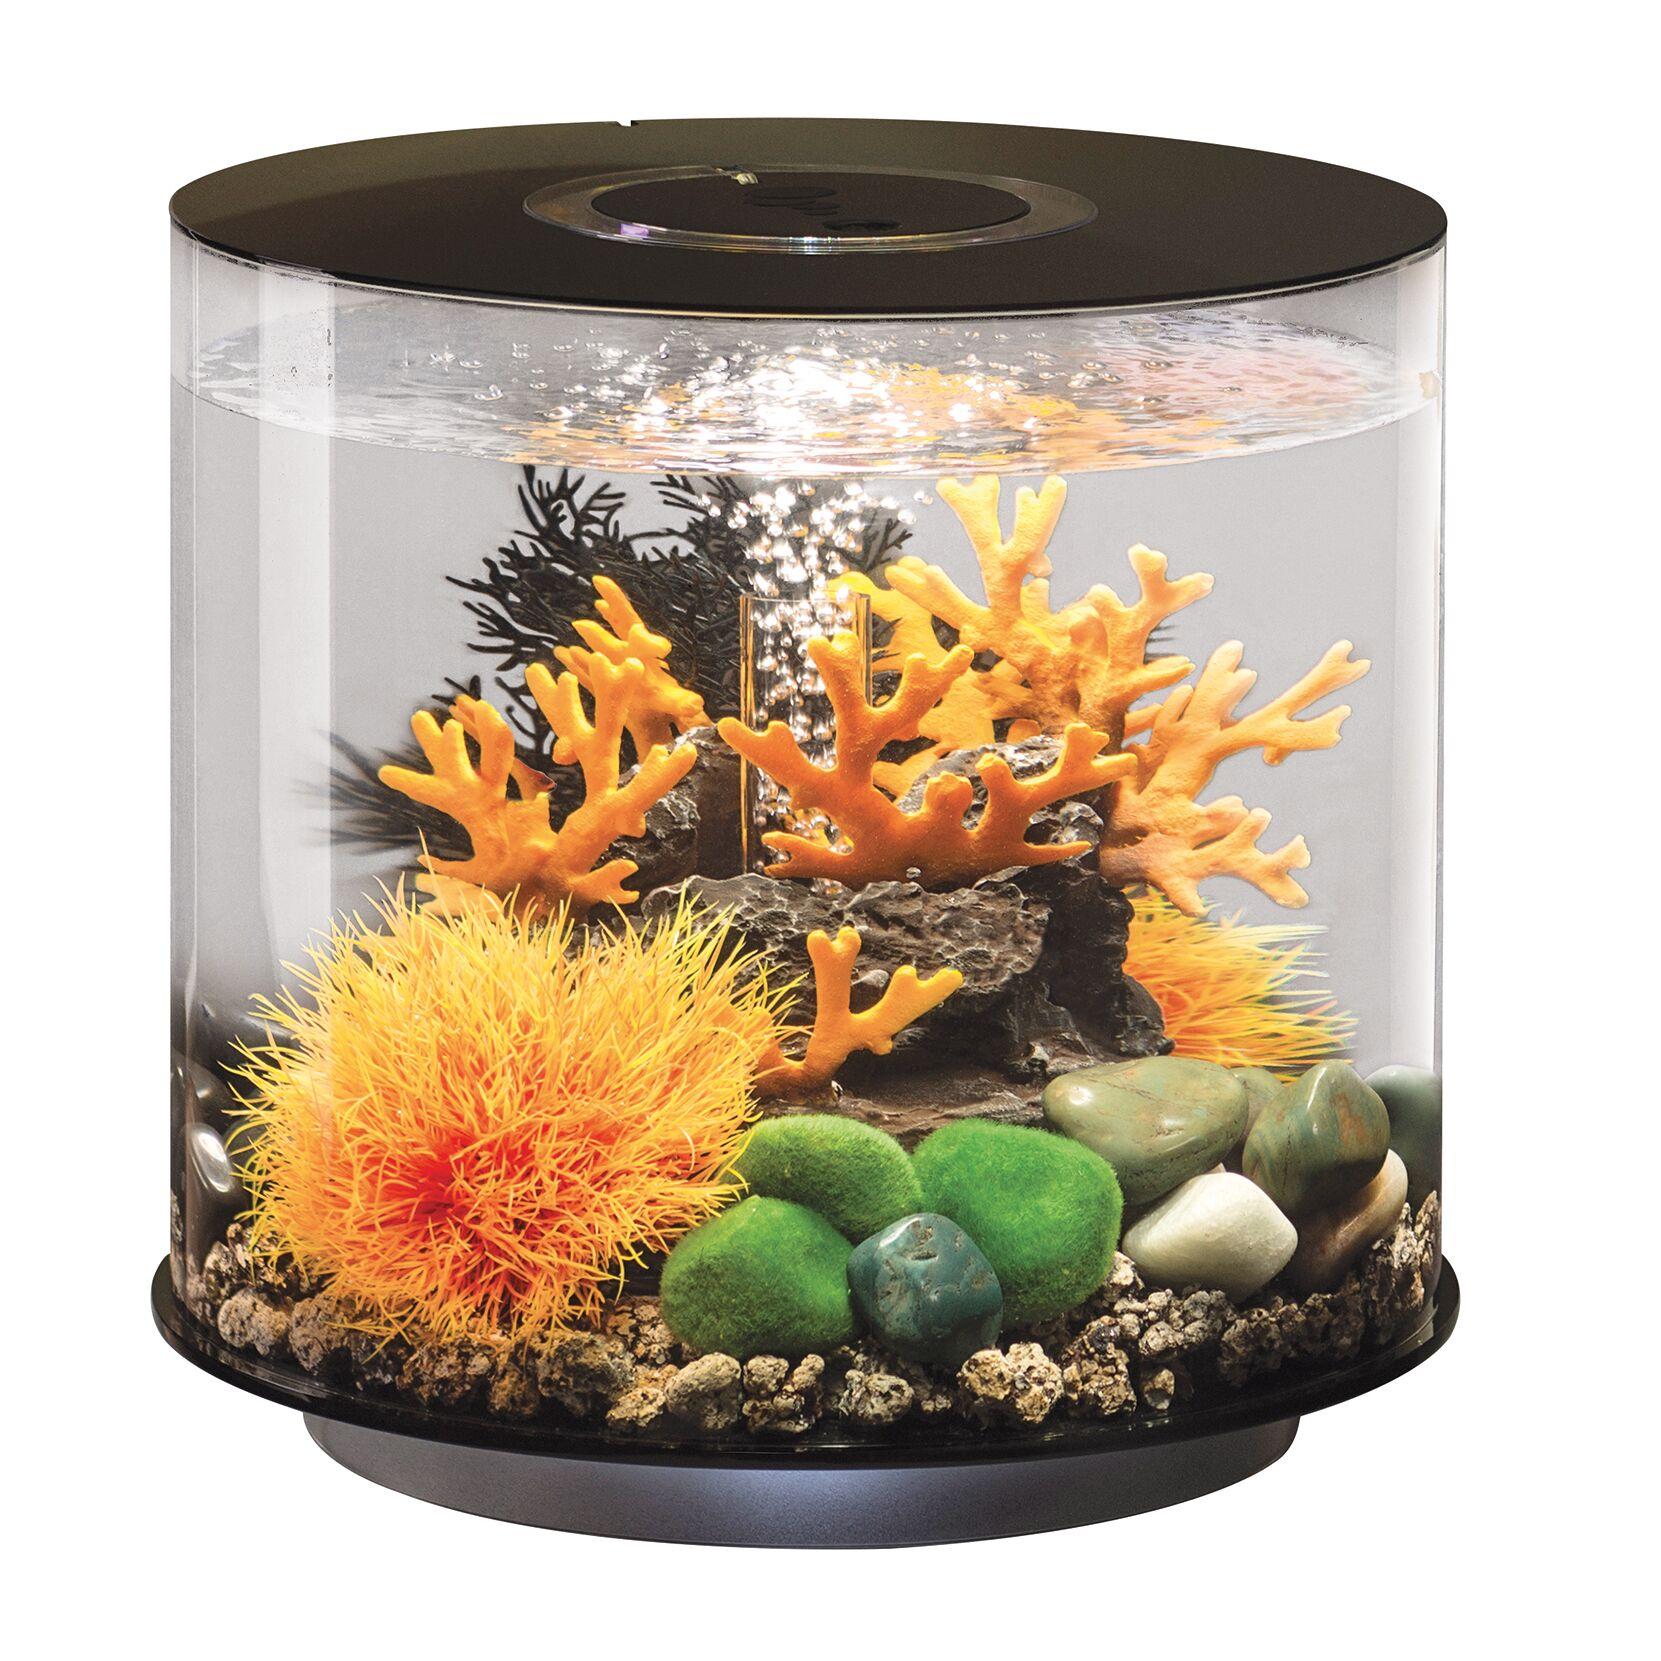 4 Gallon Tube 15 MCR Aquarium Tank Size: 14.5